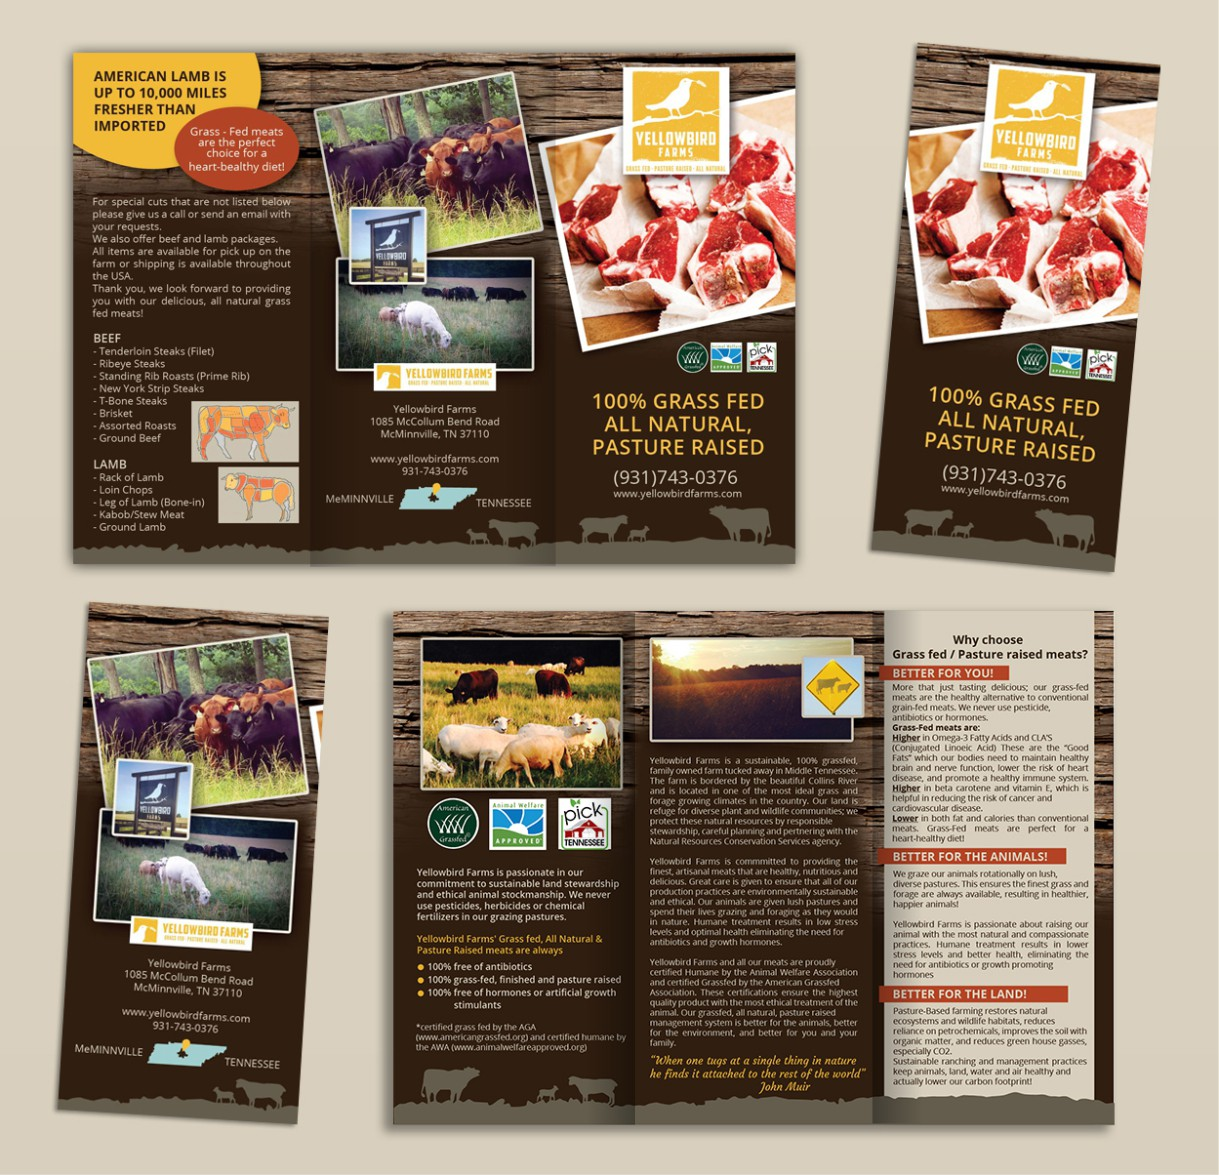 Create a brochure for Yellowbird Farms grass fed beef & lamb